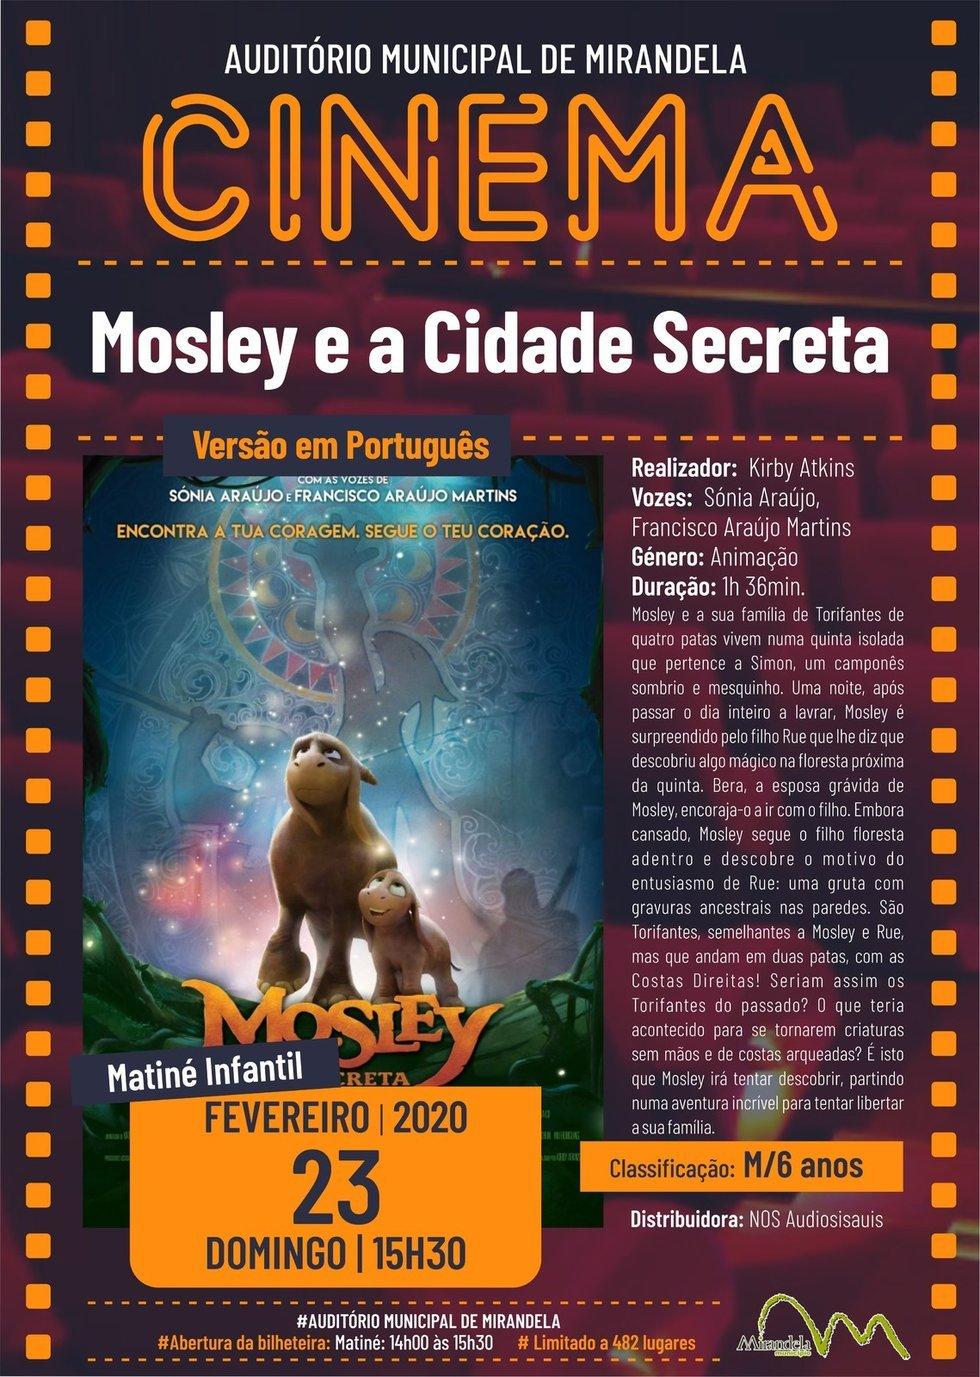 Cinema: Mosley e a Cidade Secreta